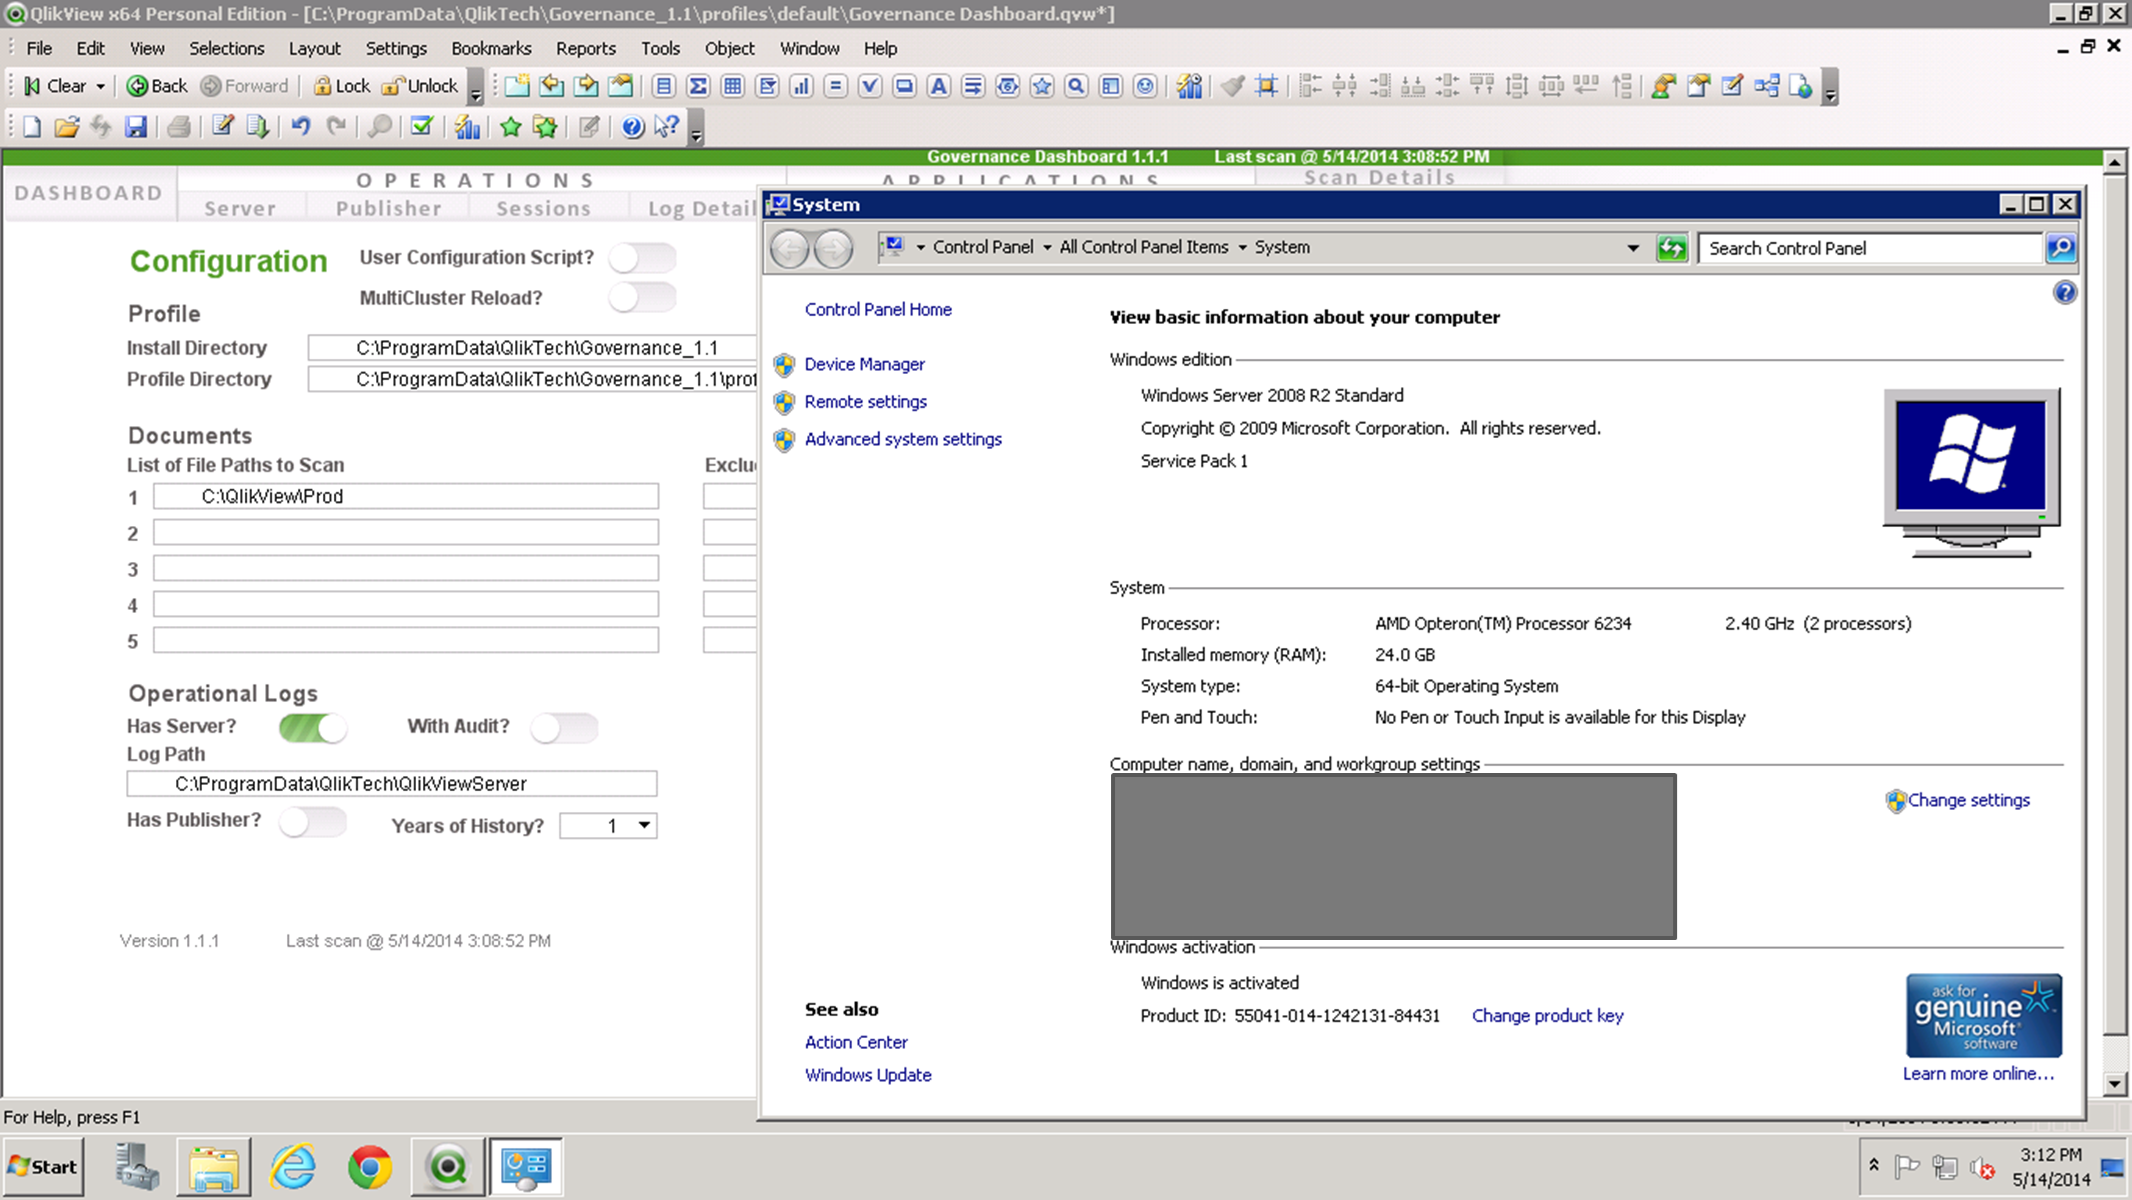 Governance Dashboard: Error in hidden script - Qlik Community